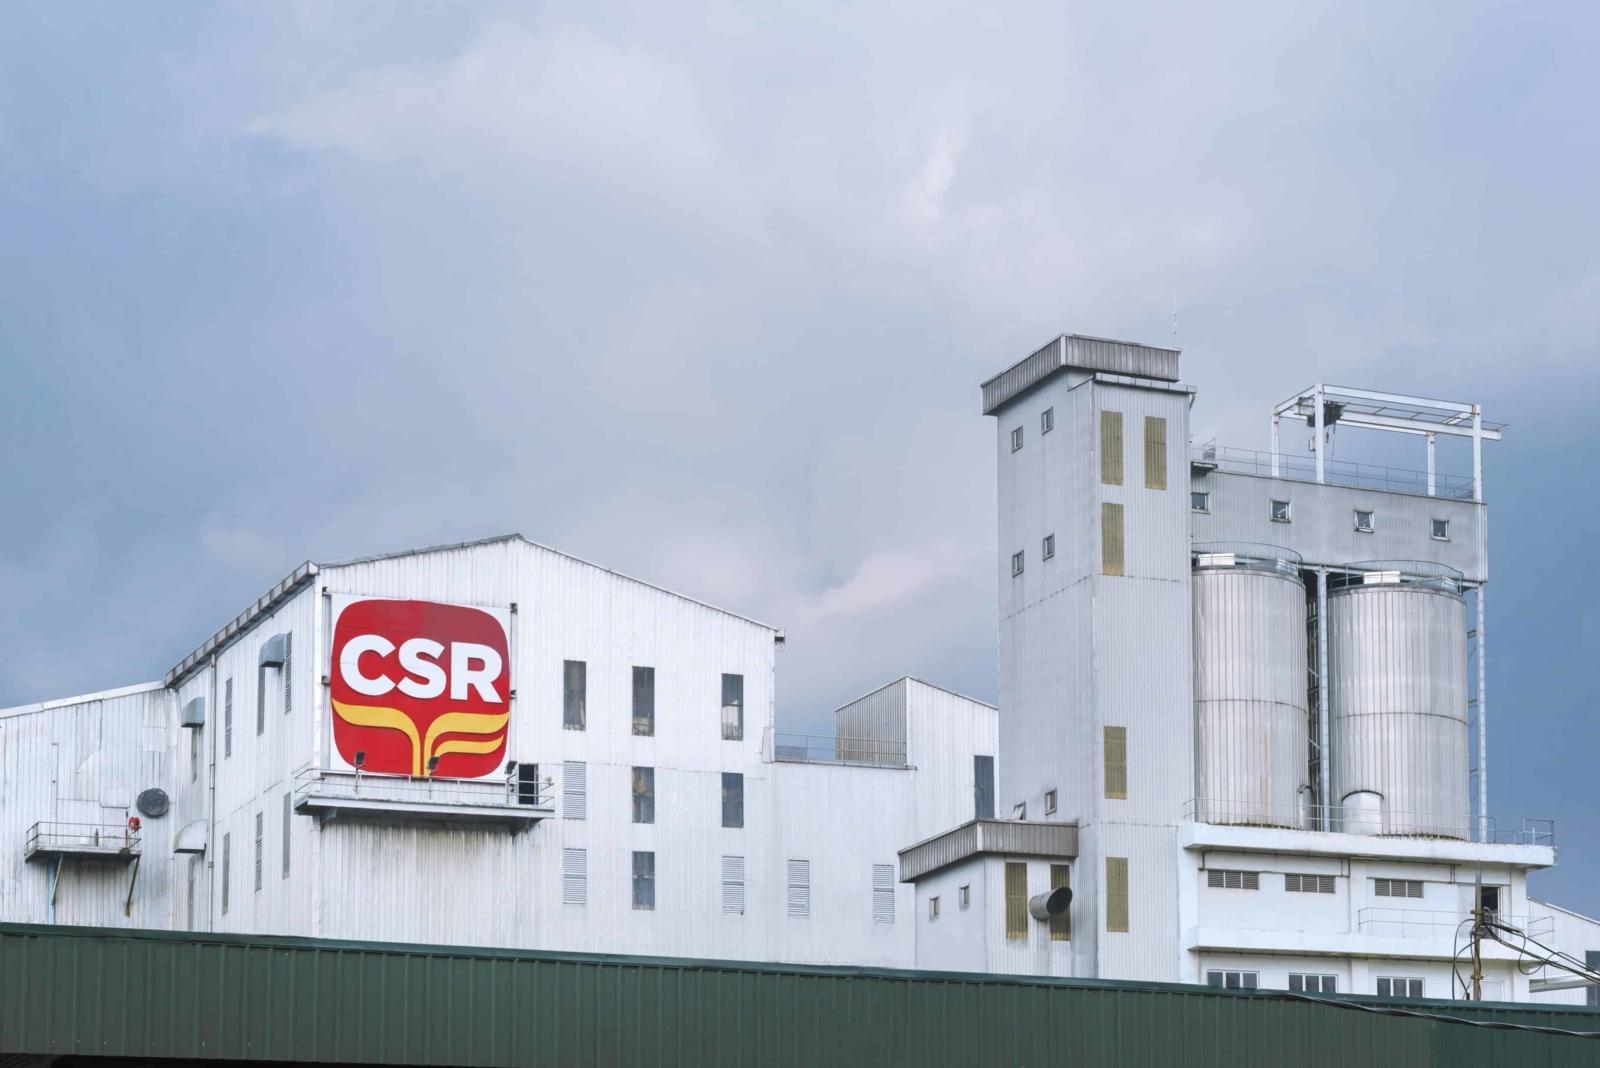 Central Sugar Refinery | Shah Alam, Malaysia